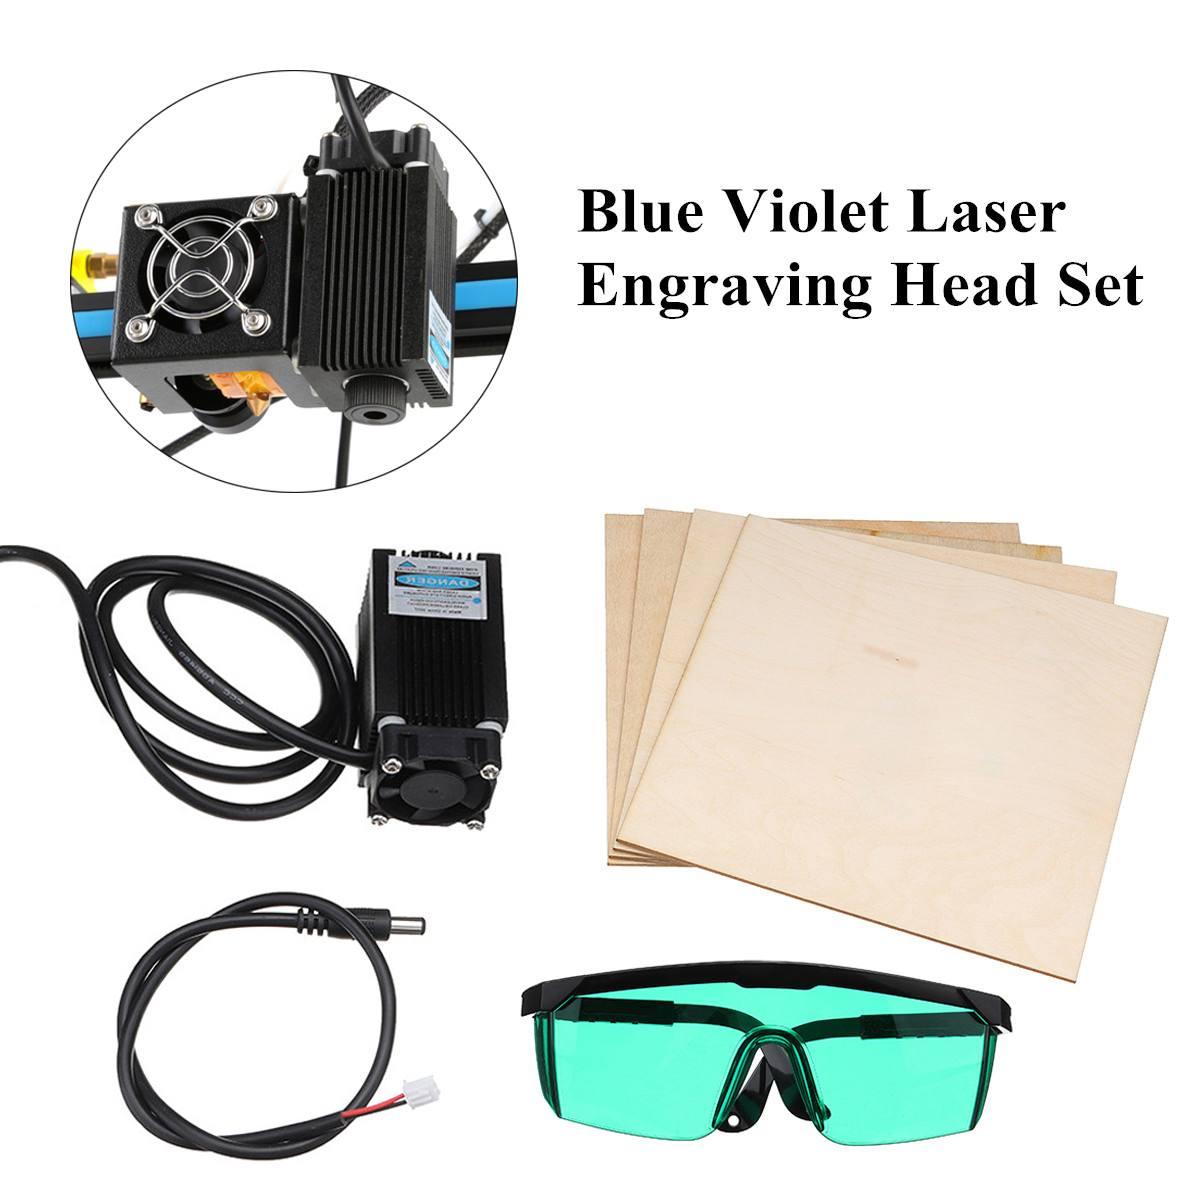 12 v Blau Violett Laser Gravur Kopf Set Mit Gläser Holz Platten Modul Blau Violett Für Creality CR-10 CR-10S 3D drucker